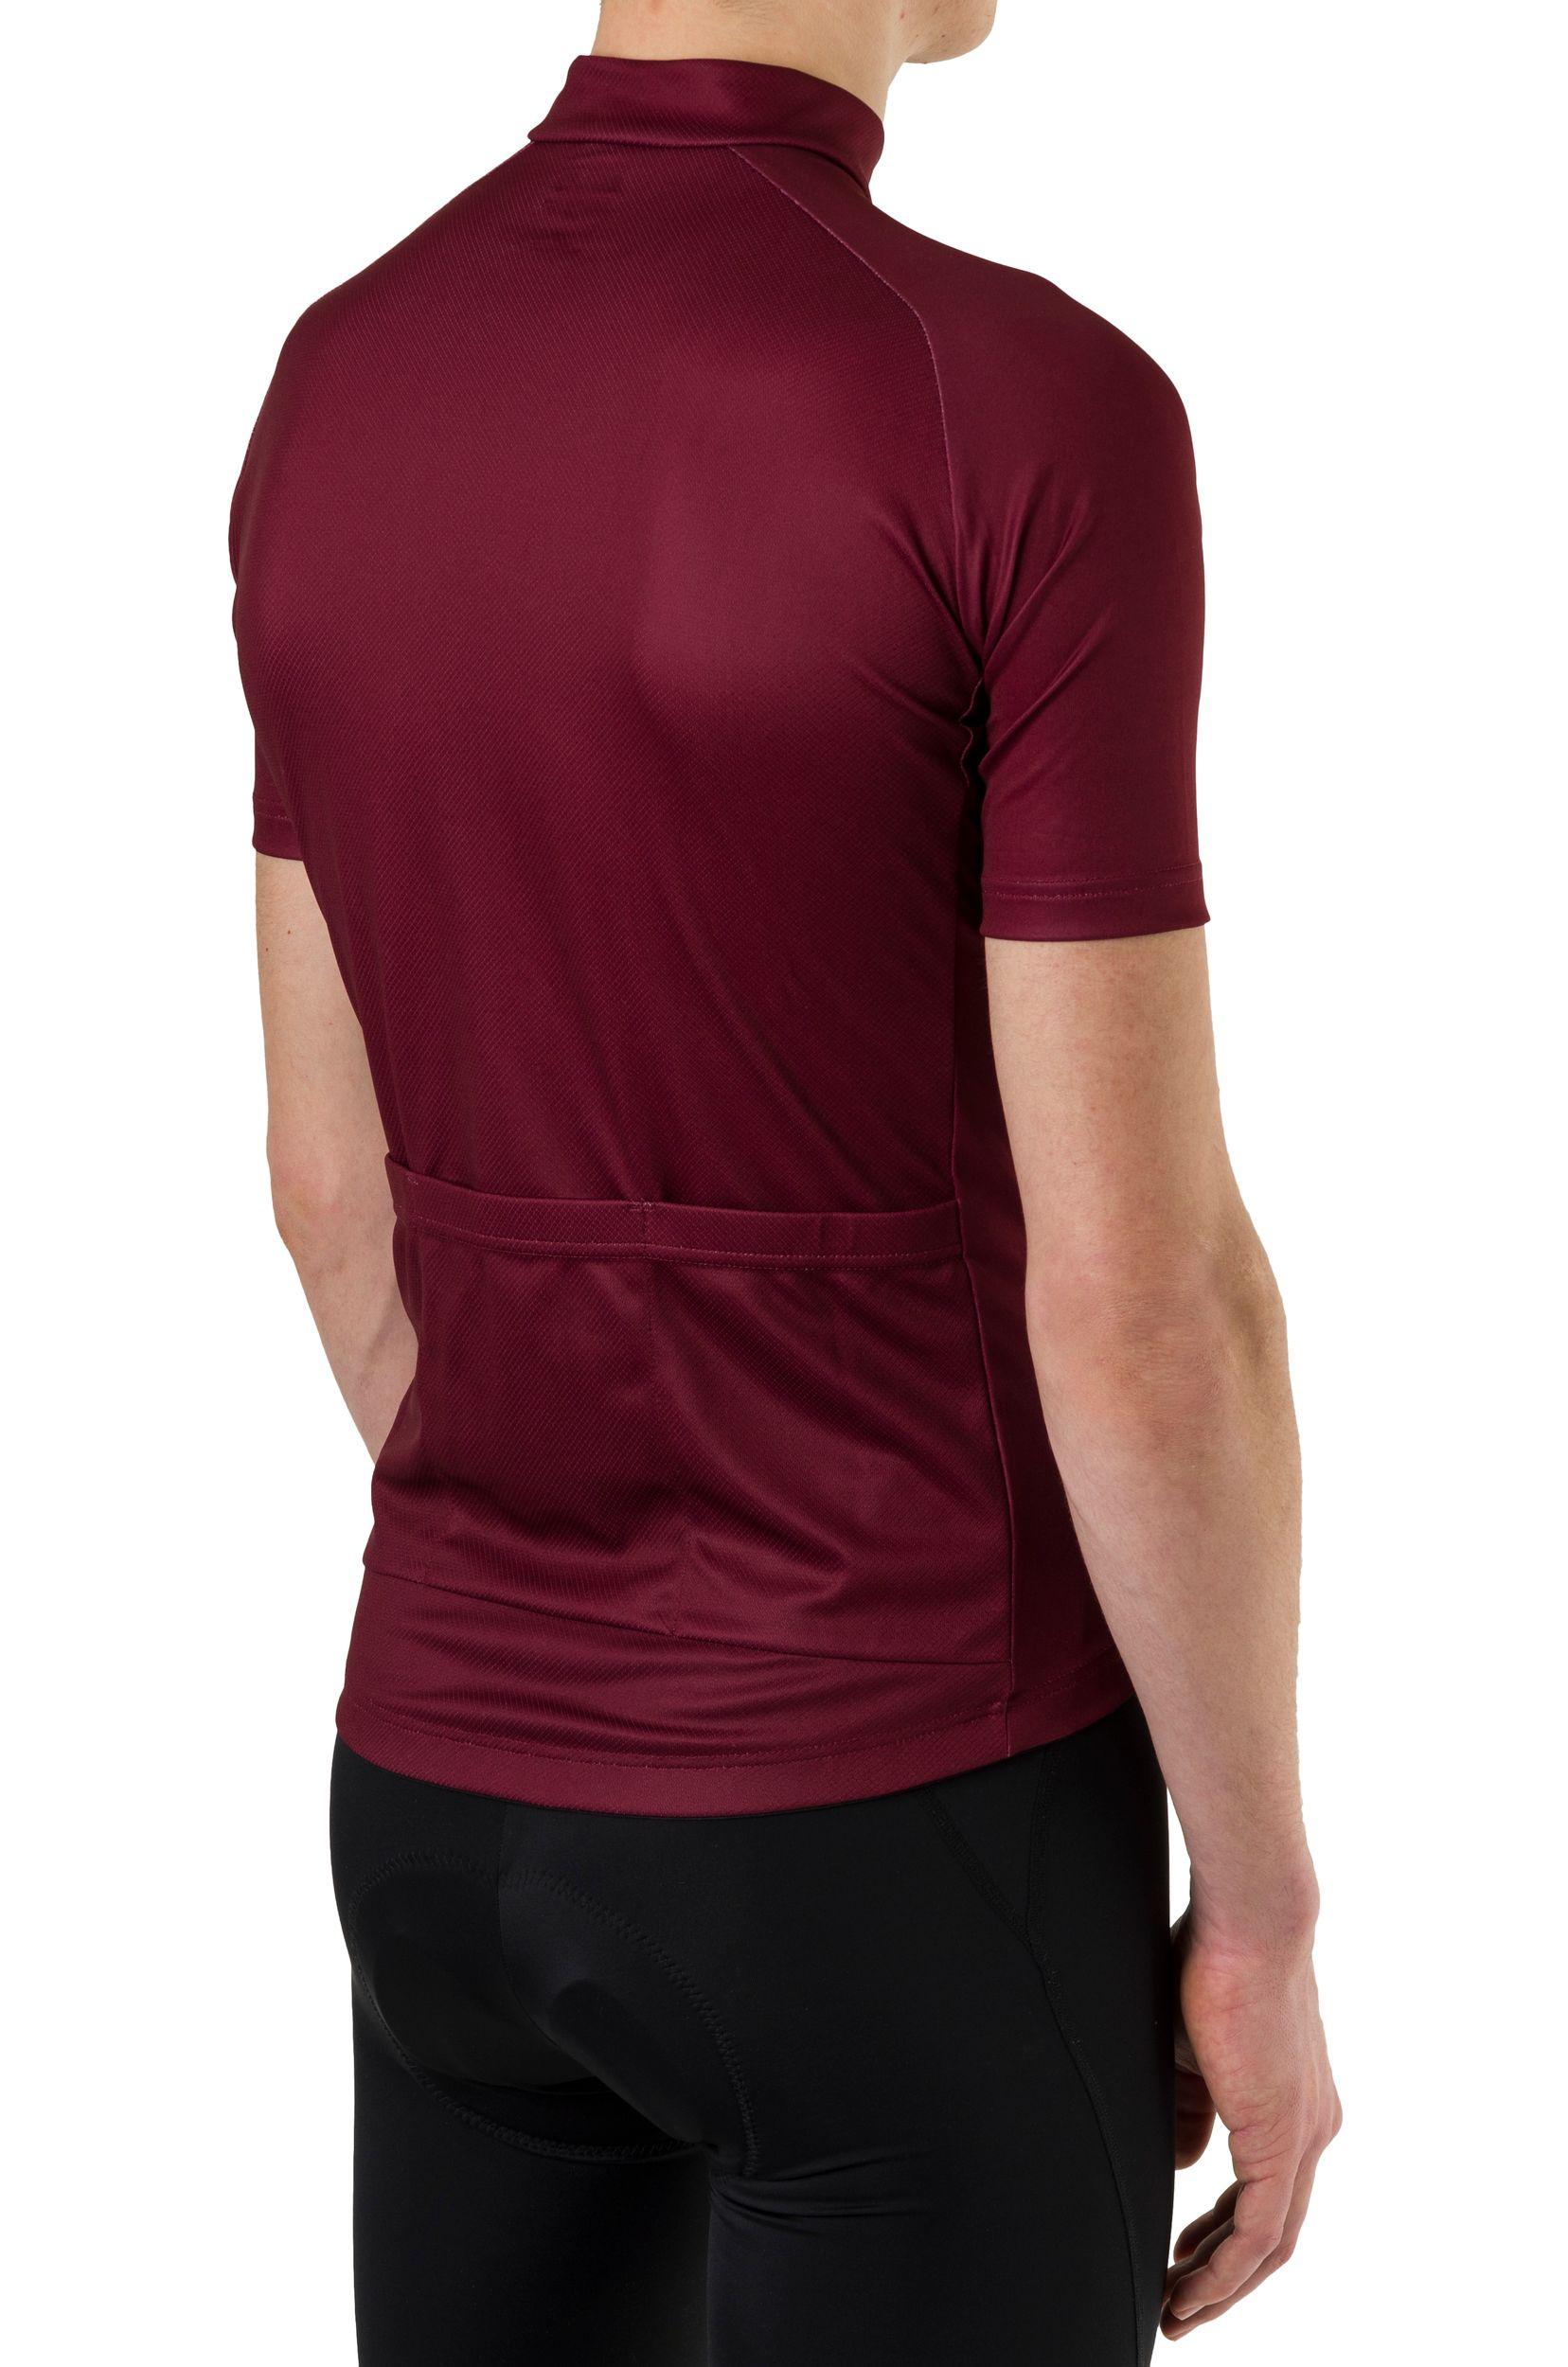 Striped Fietsshirt Essential Heren fit example